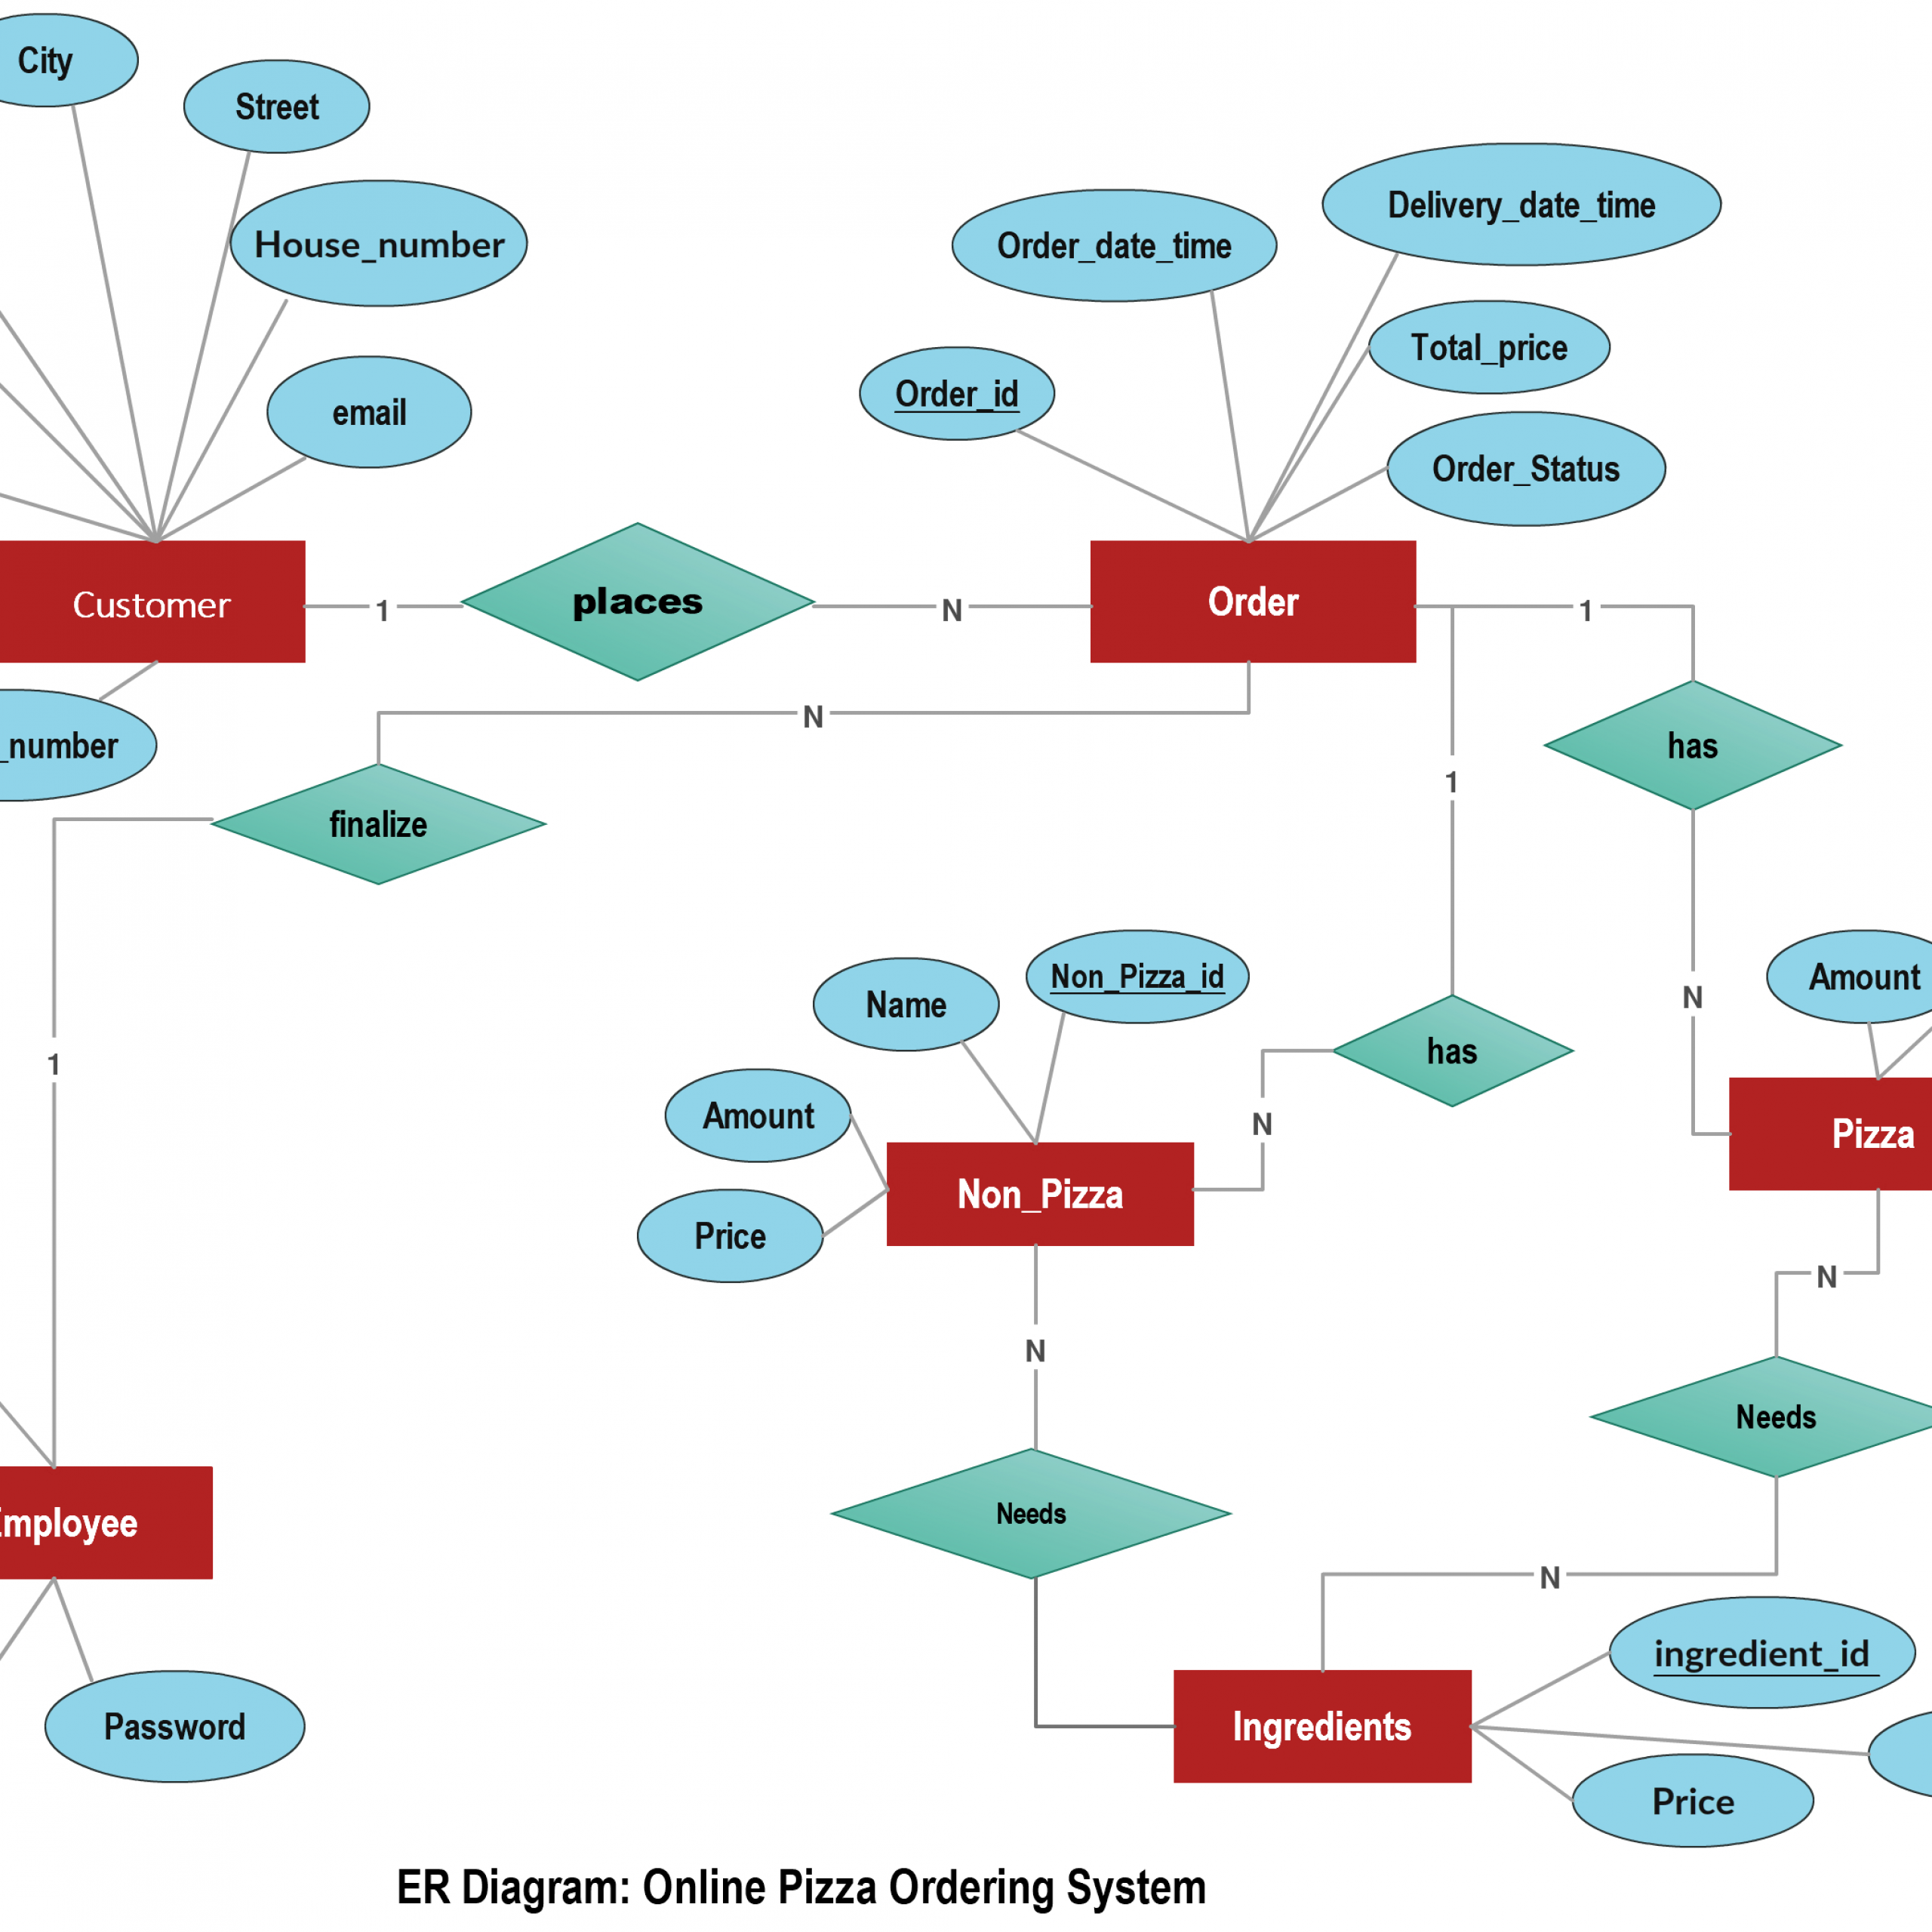 Online Pizza Ordering System Illustrated Using An Er Diagram pertaining to Er Diagram Online